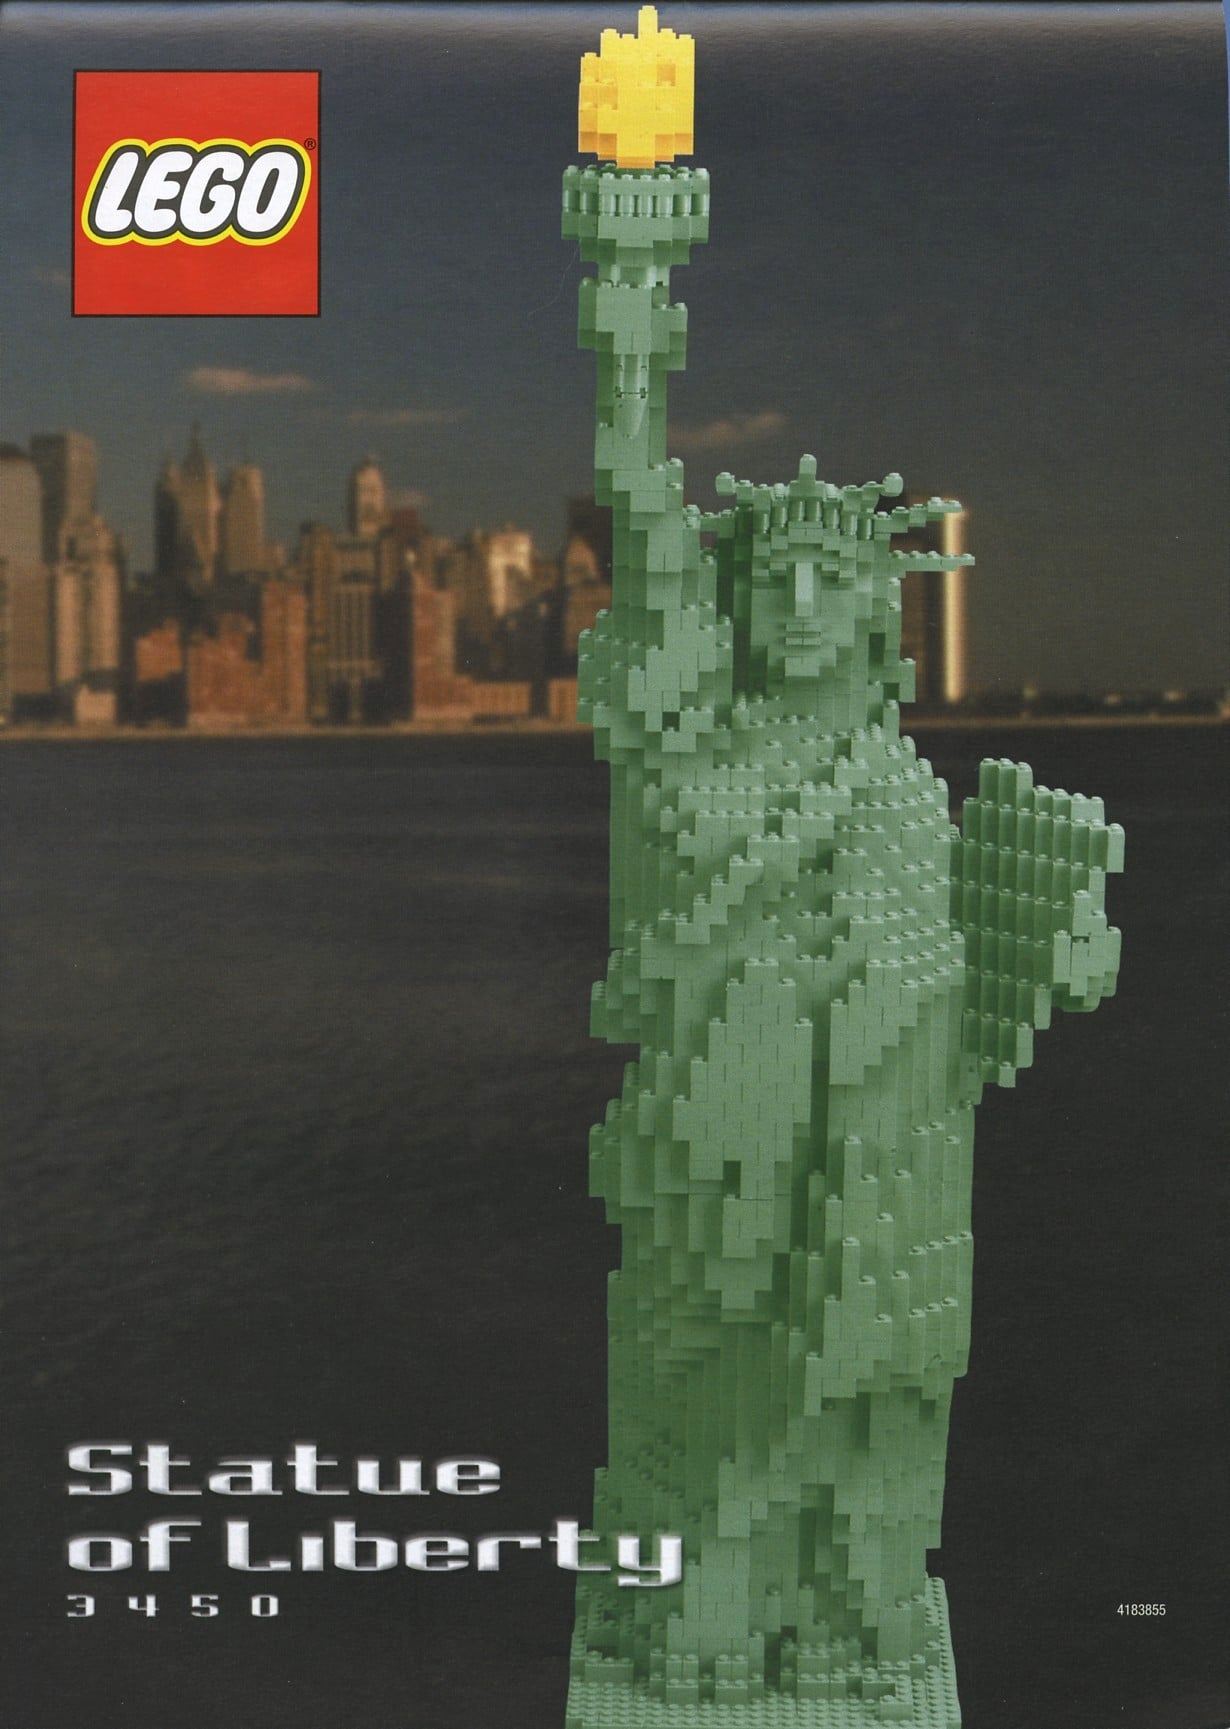 LEGO 3450 Freiheitsstatue